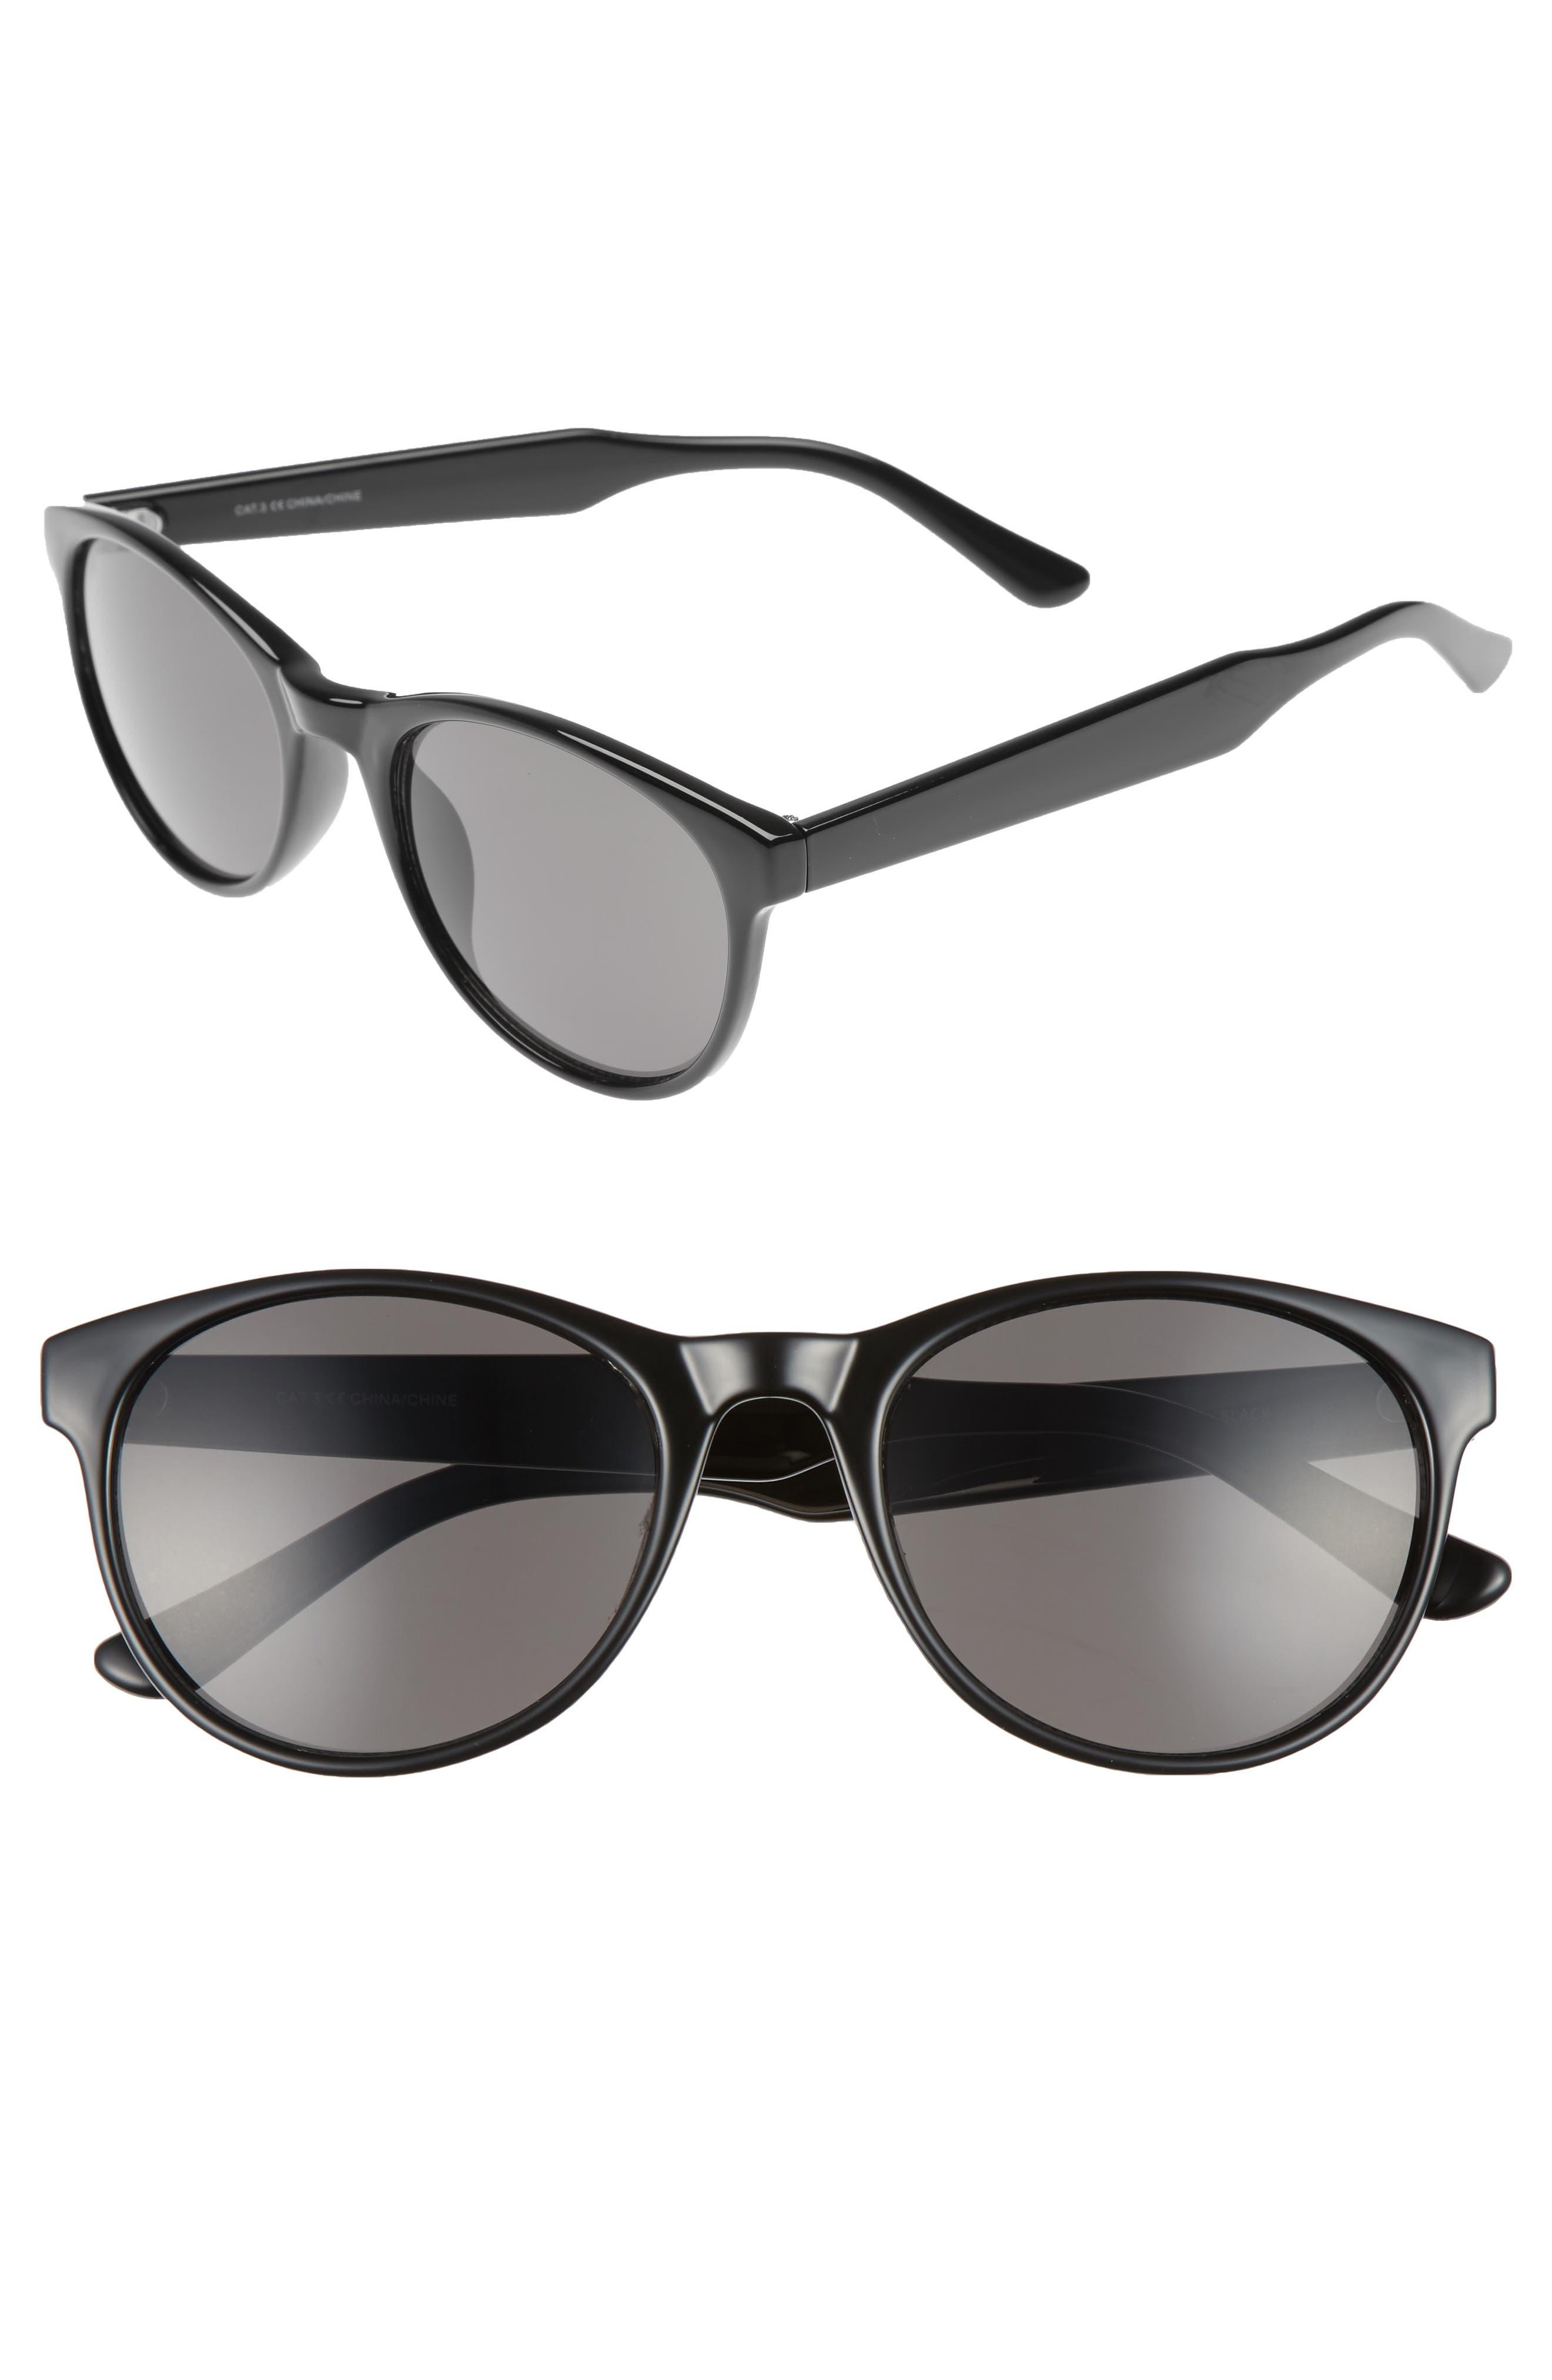 Main Image - 1901 Victor 54mm Sunglasses